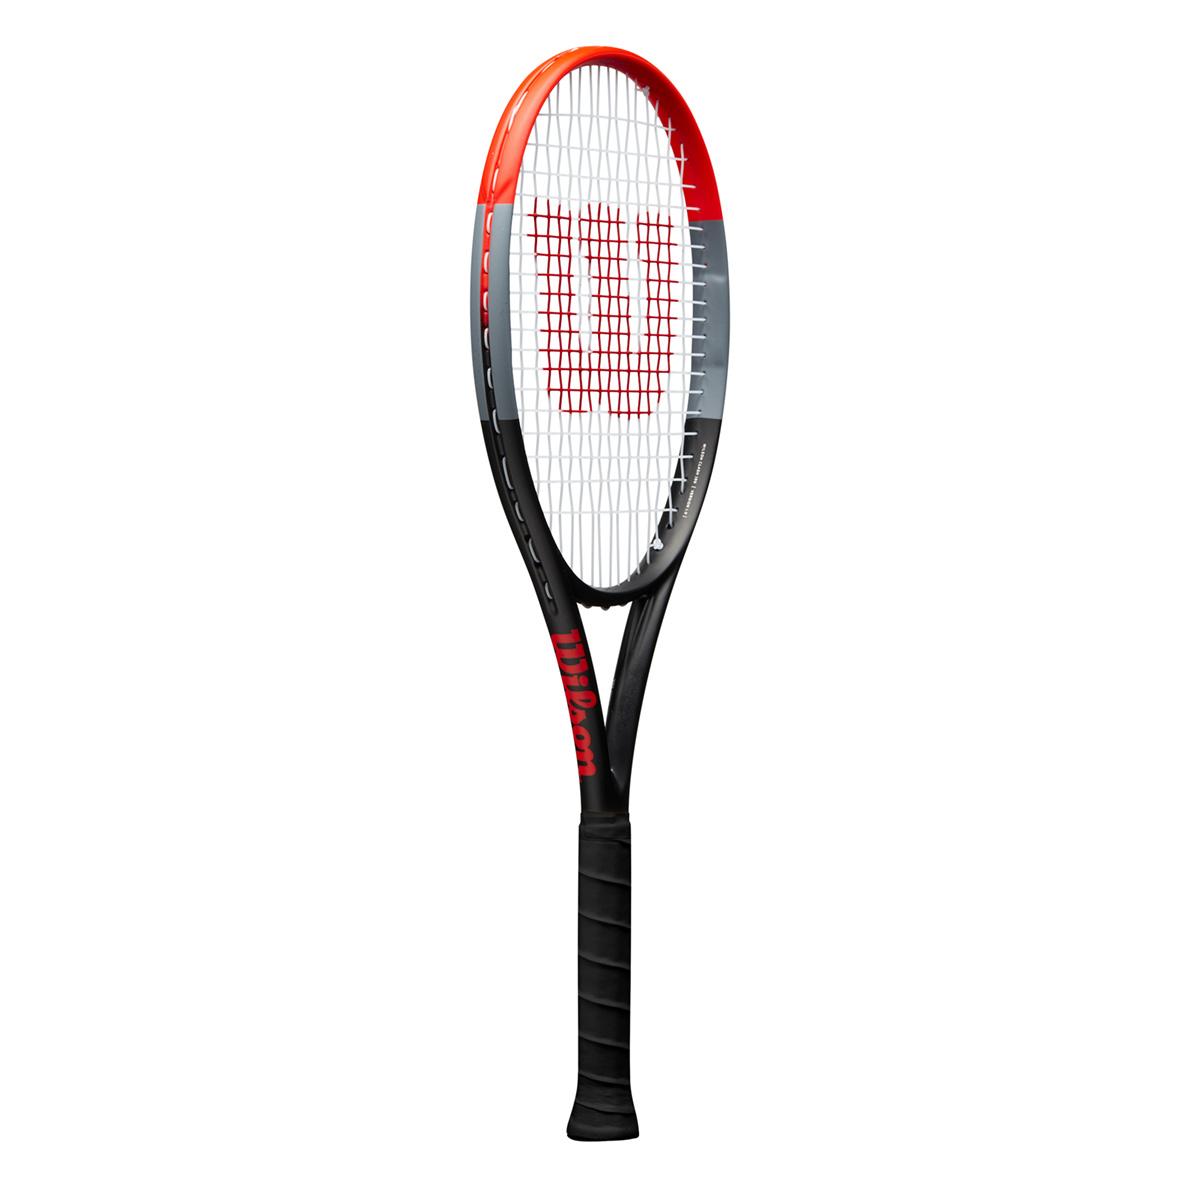 WR8401001_1_Clash_Mini_Racquet_RD_GY_BL_Side